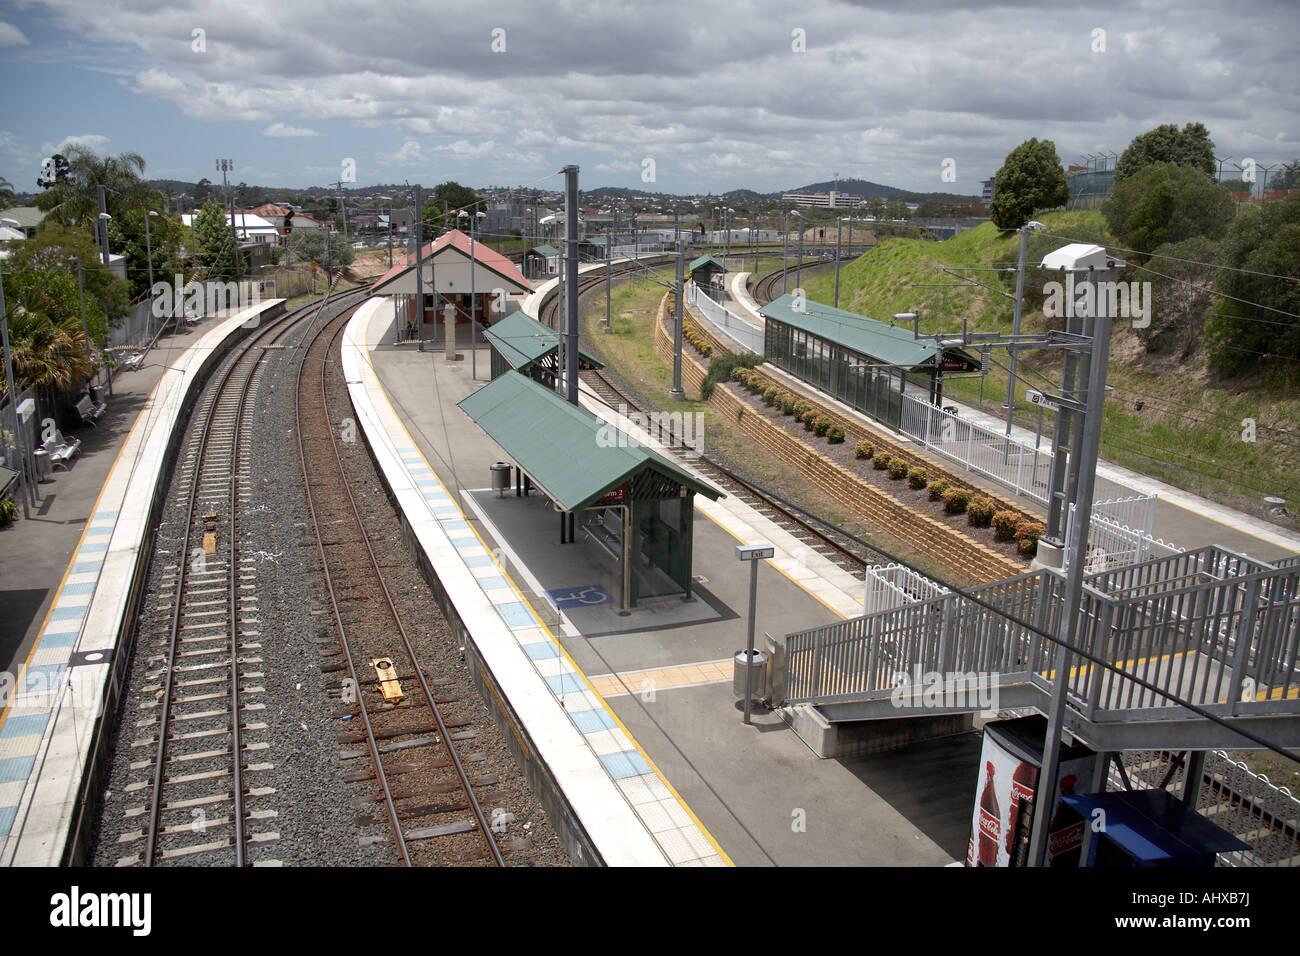 Suburban electric train at Park Road railway station in Brisbane Queensland QLD Australia - Stock Image